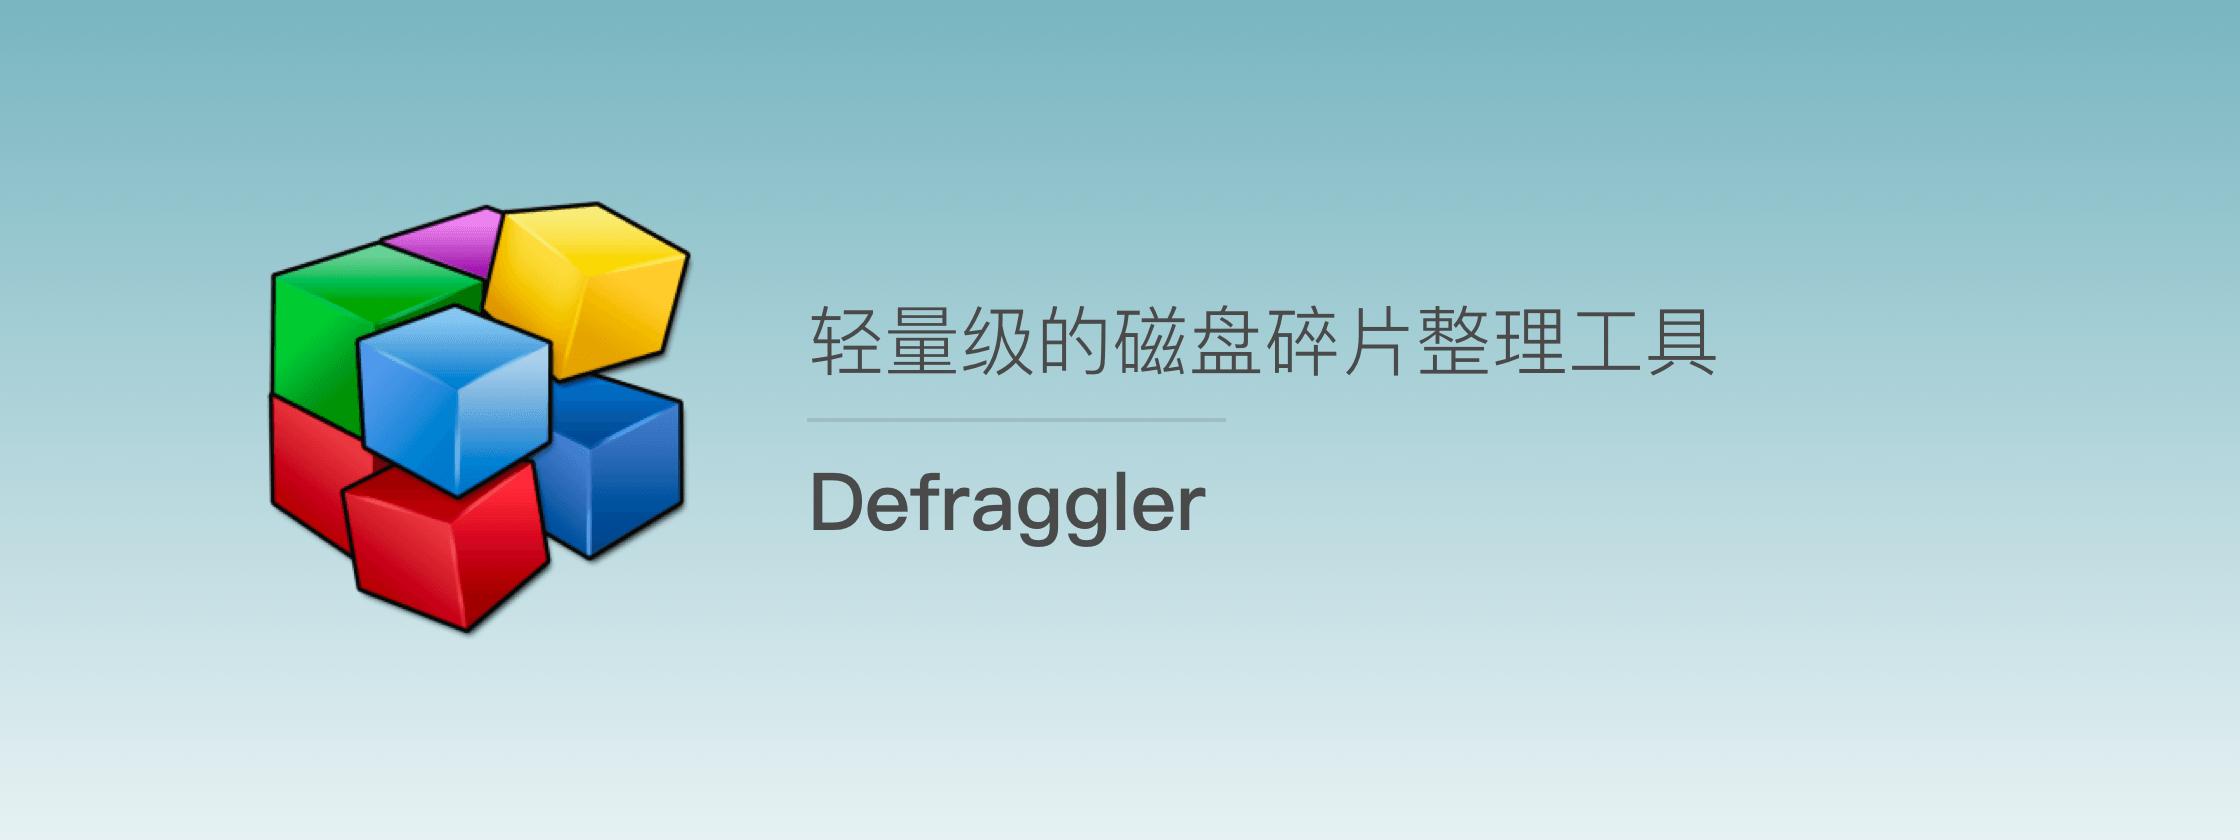 Defraggler – 轻量级的磁盘碎片整理工具